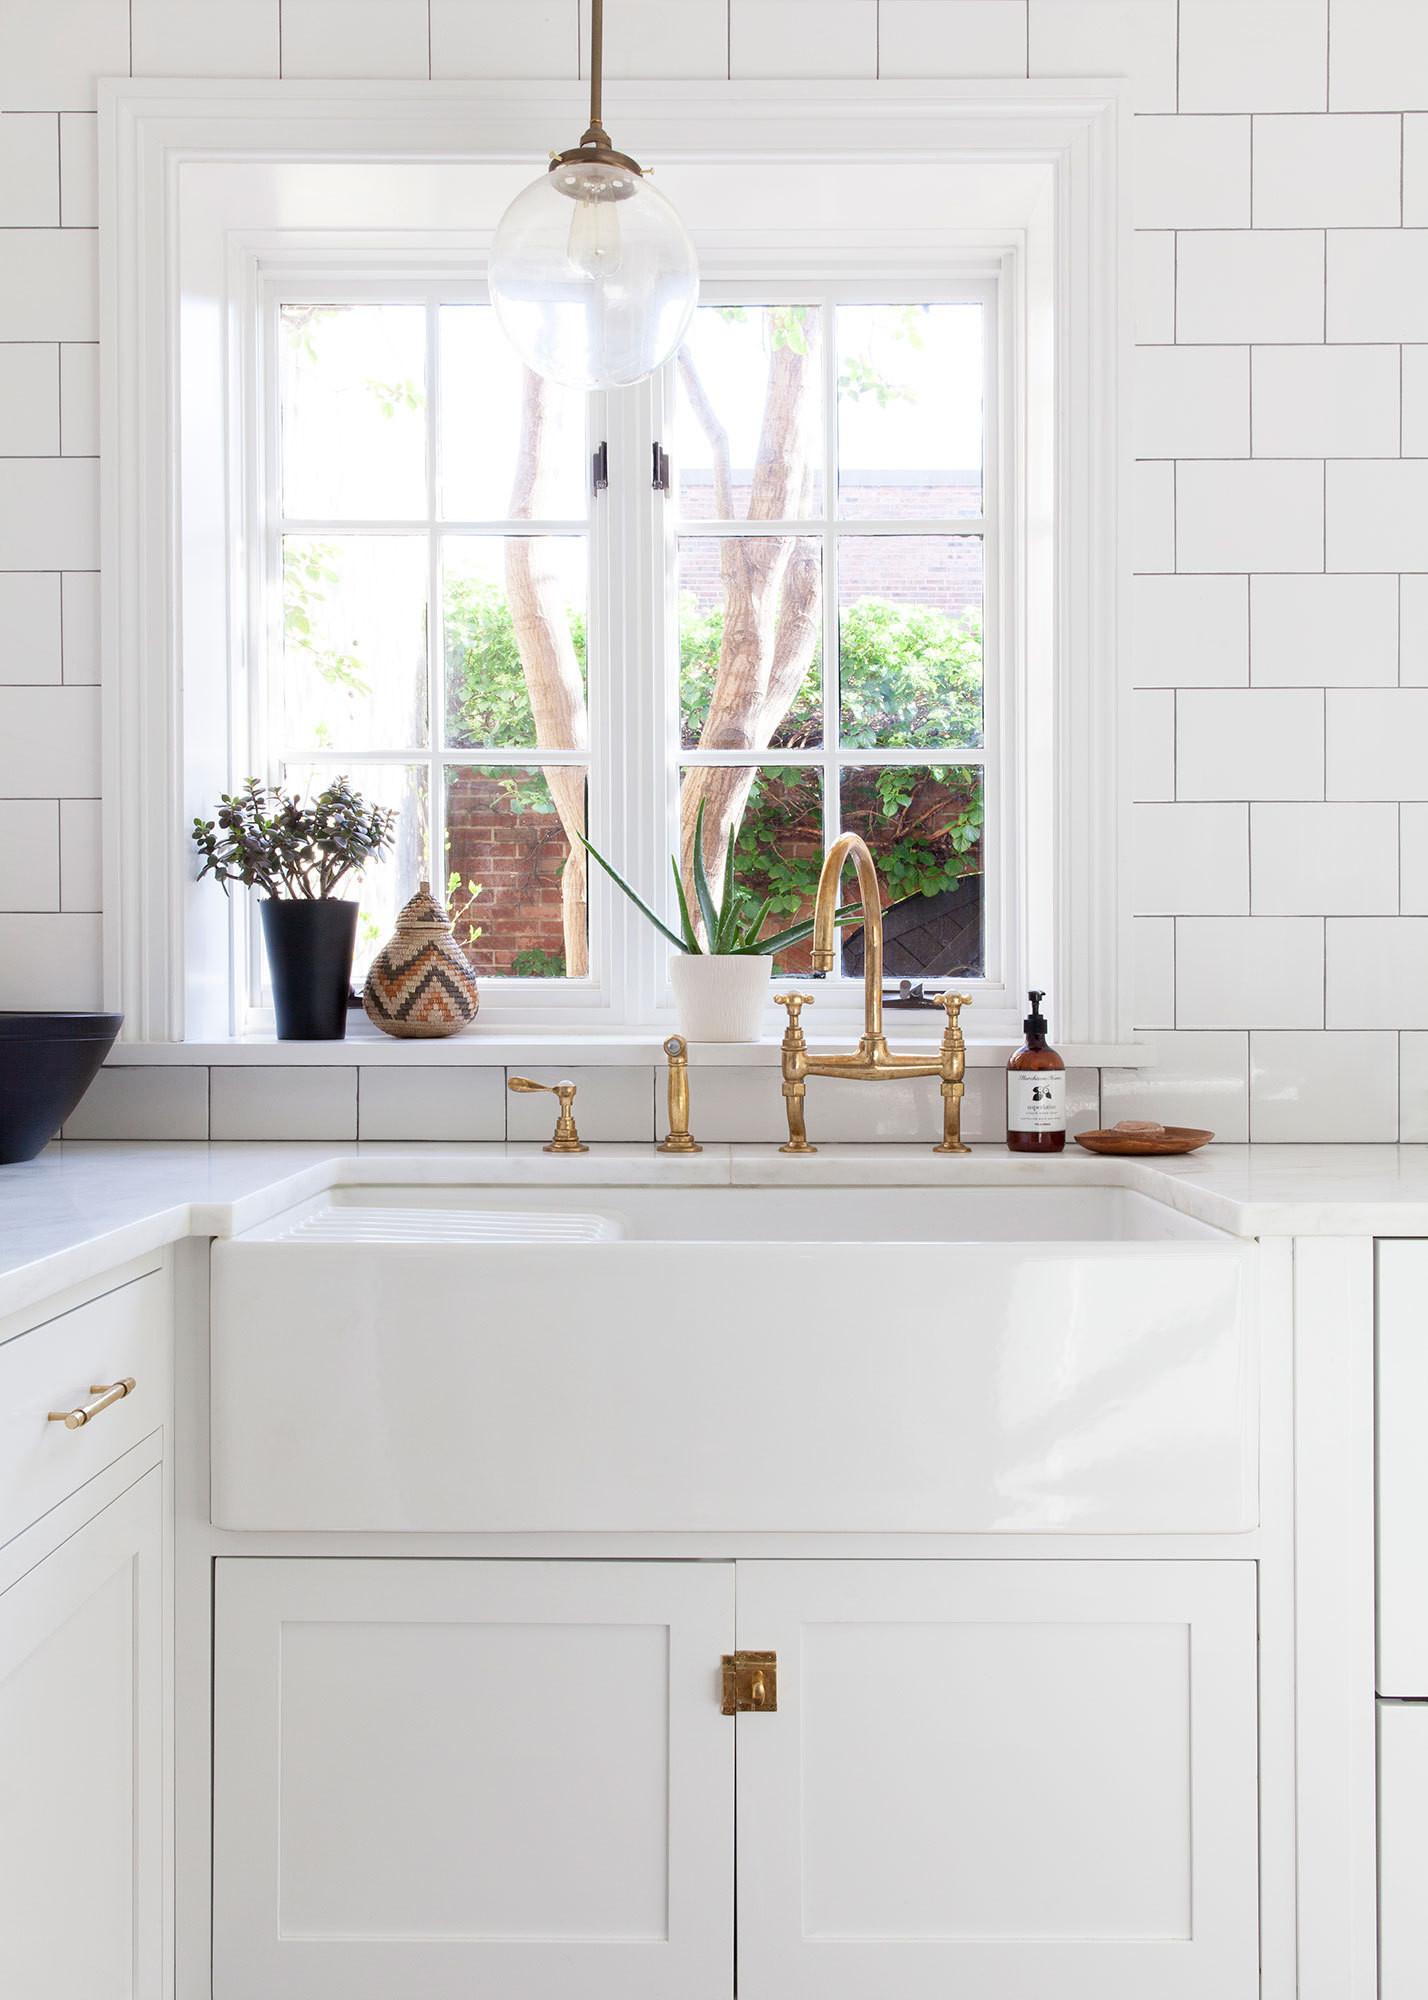 specifications daniel frisch architecture unlacquered brass kitchen faucet Kitchen Trend Brass Hardware Blue Door Living